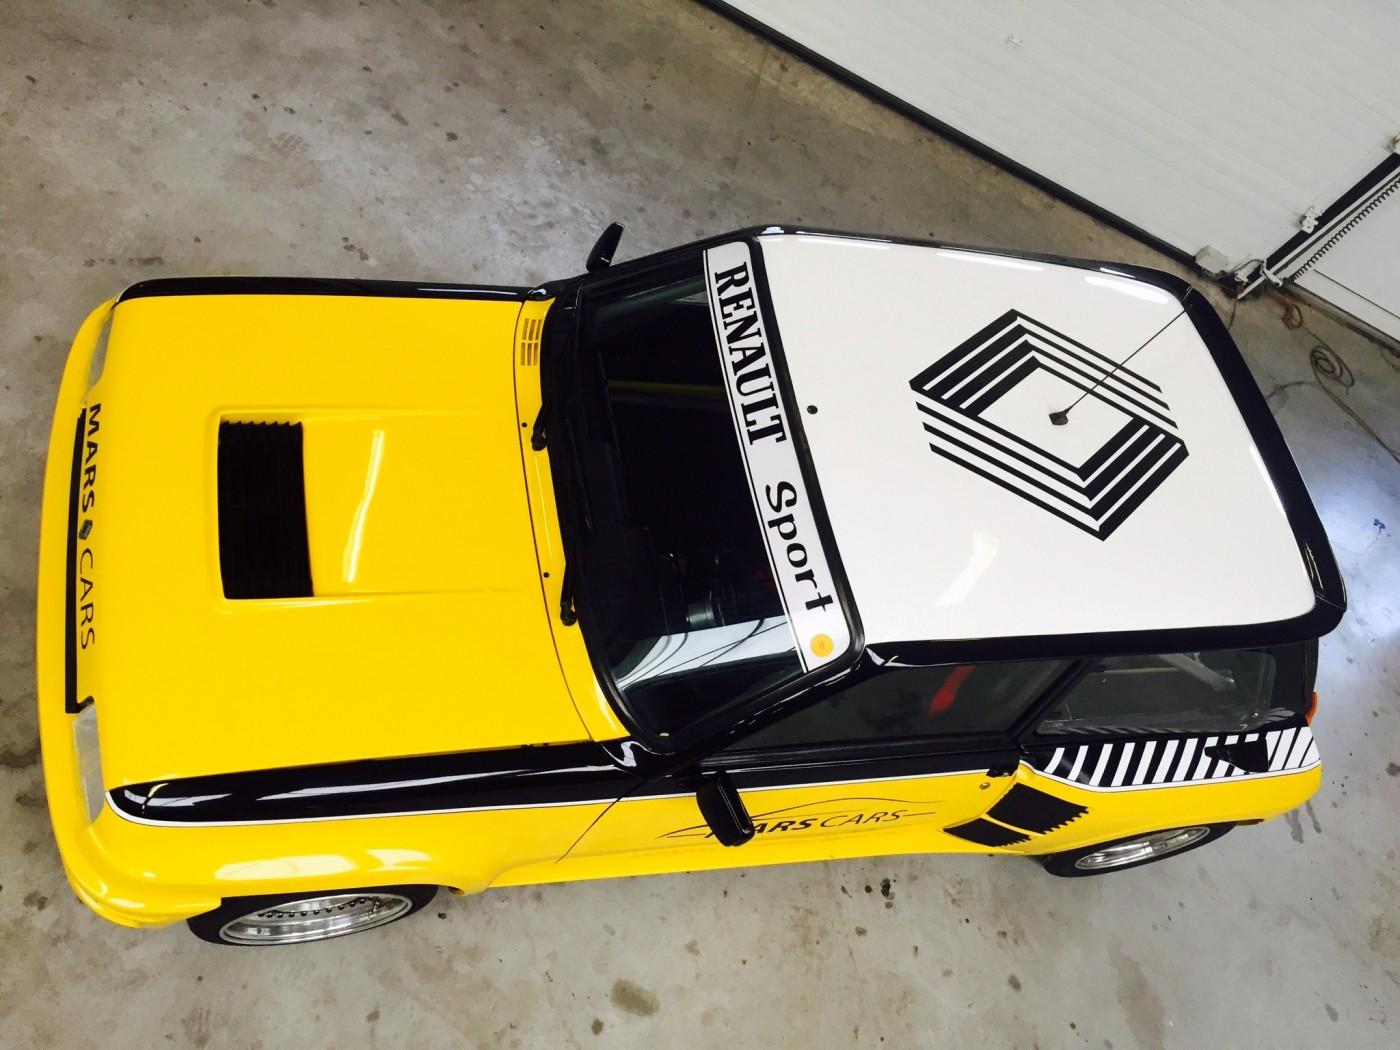 Renault_5_R5_Turbo_2_0014